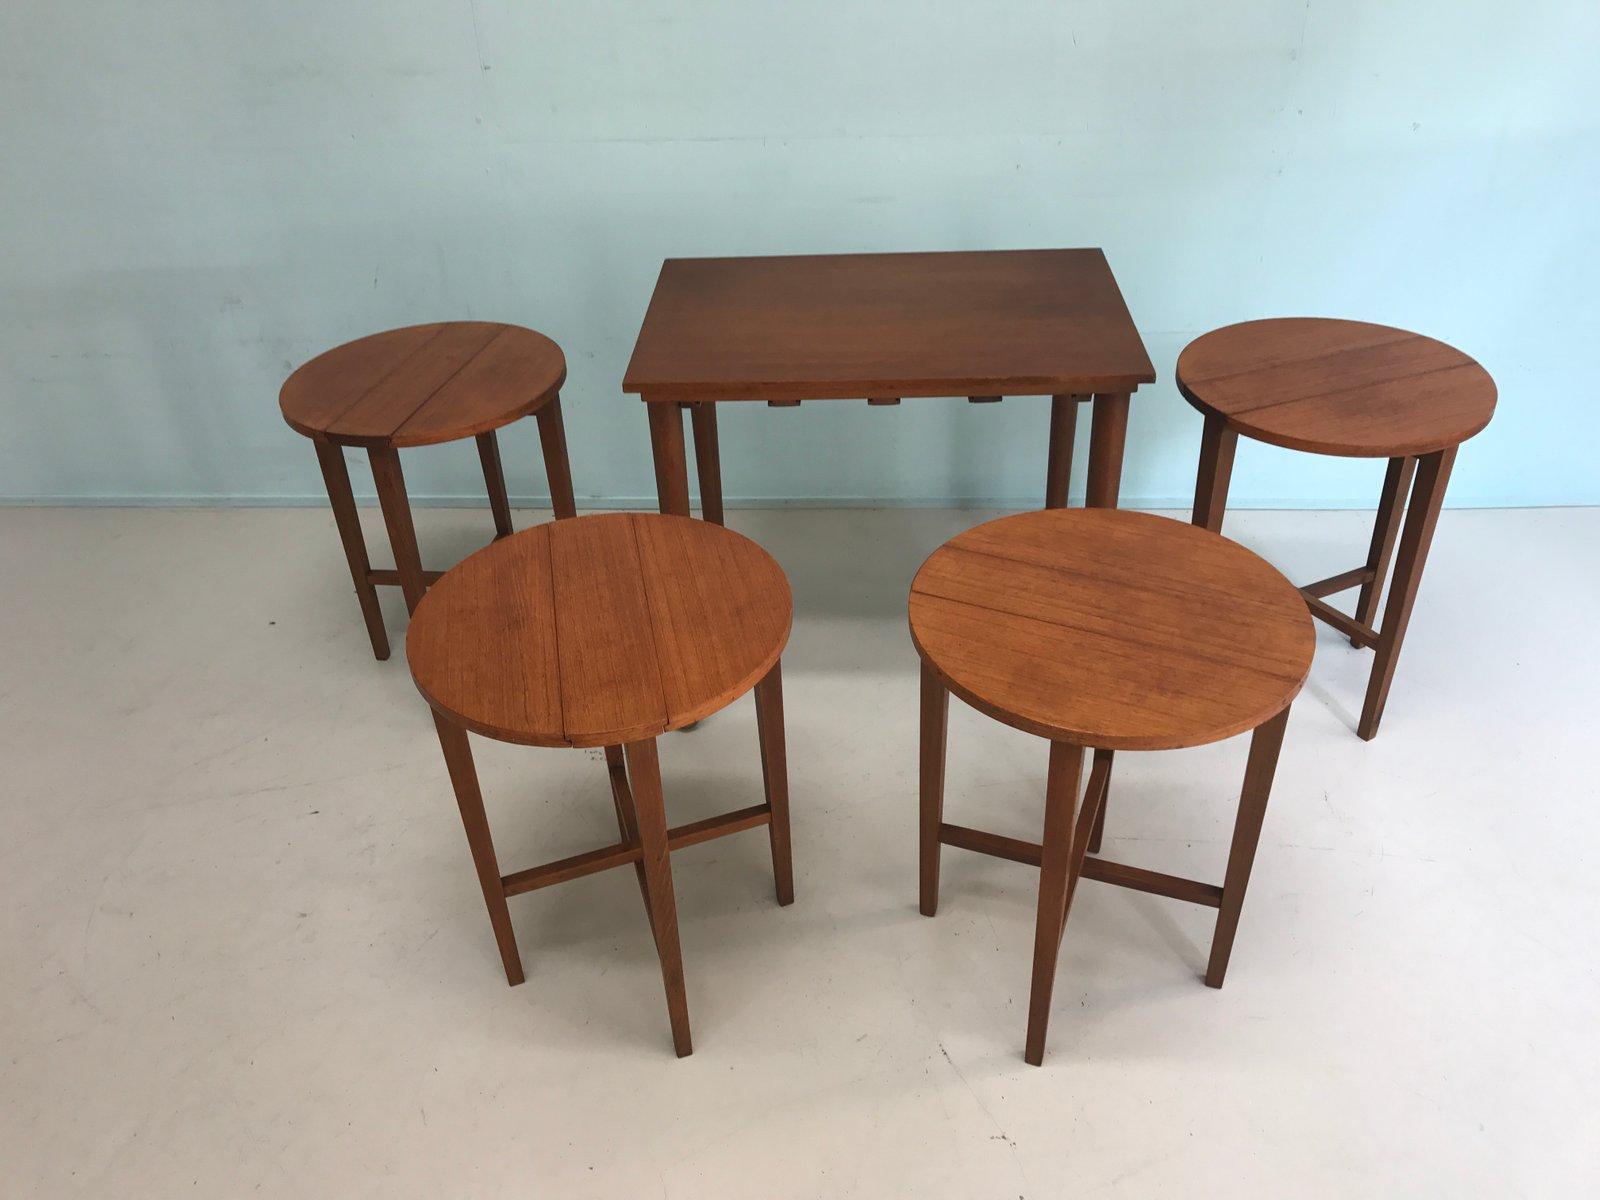 Vintage Nesting Tables ~ Vintage nesting side tables s for sale at pamono